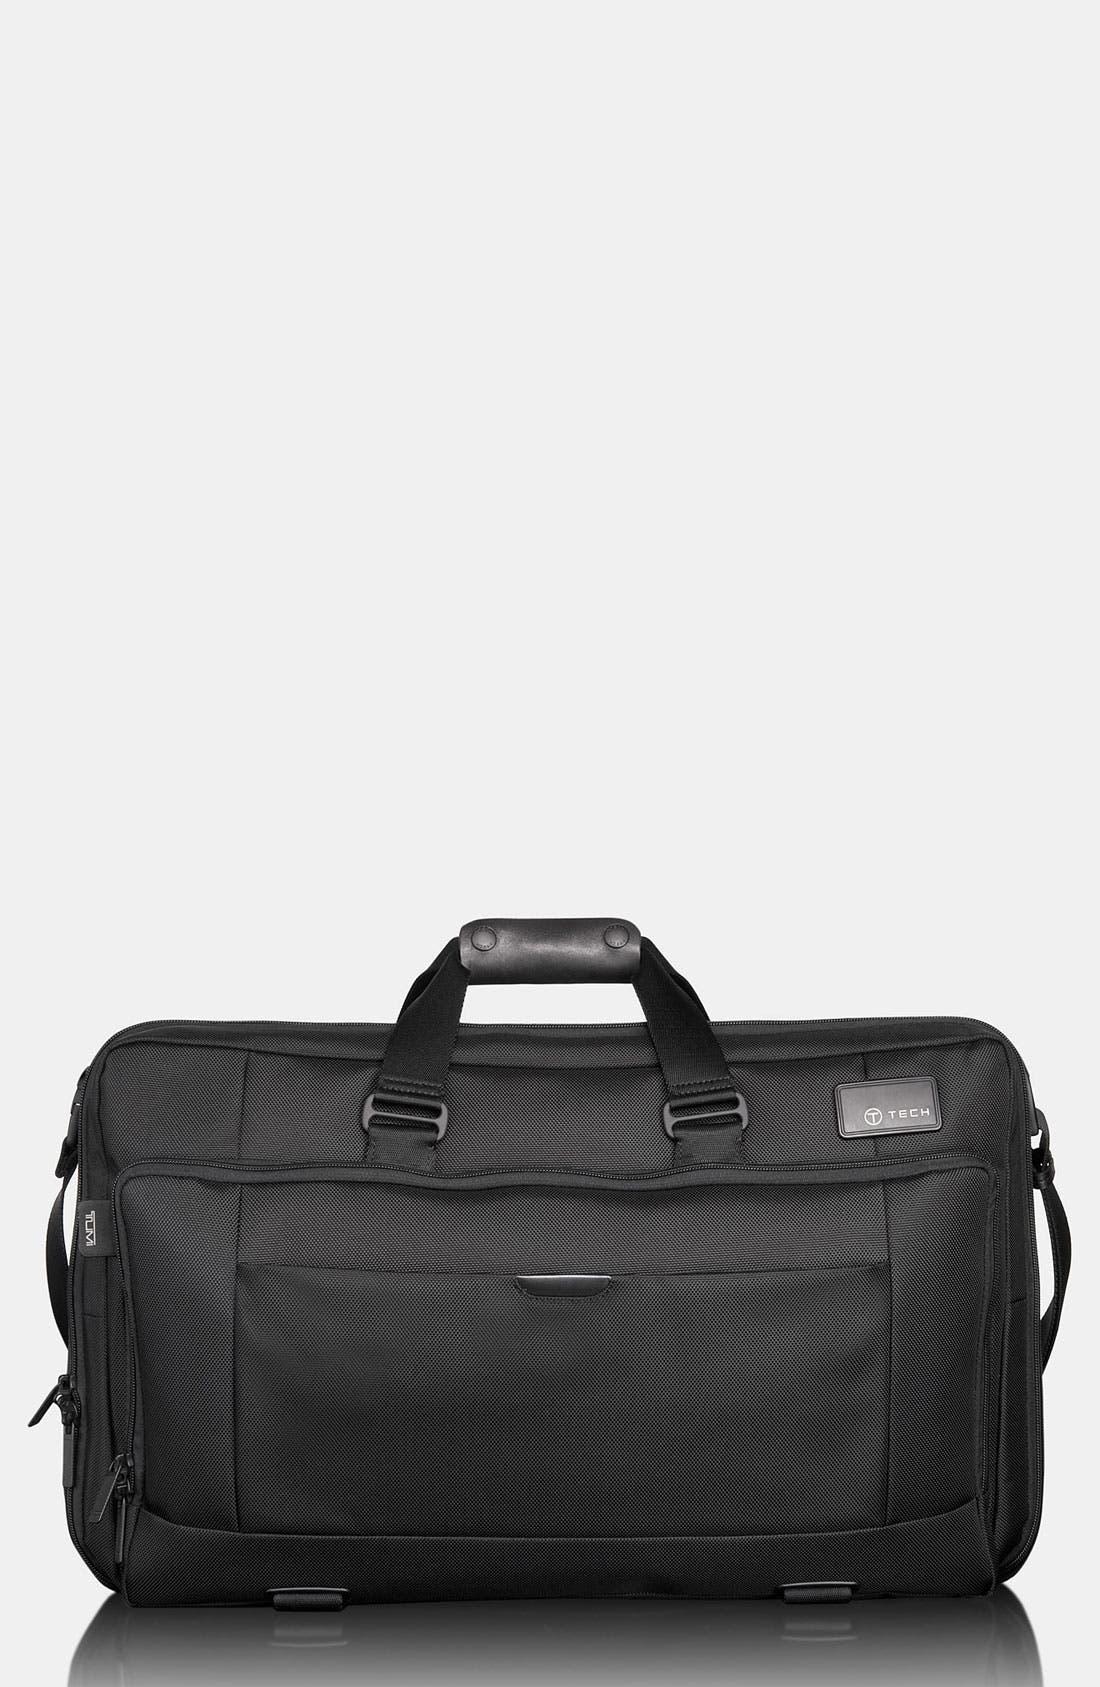 Alternate Image 1 Selected - Tumi 'T-Tech Network' Trifold Garment Bag